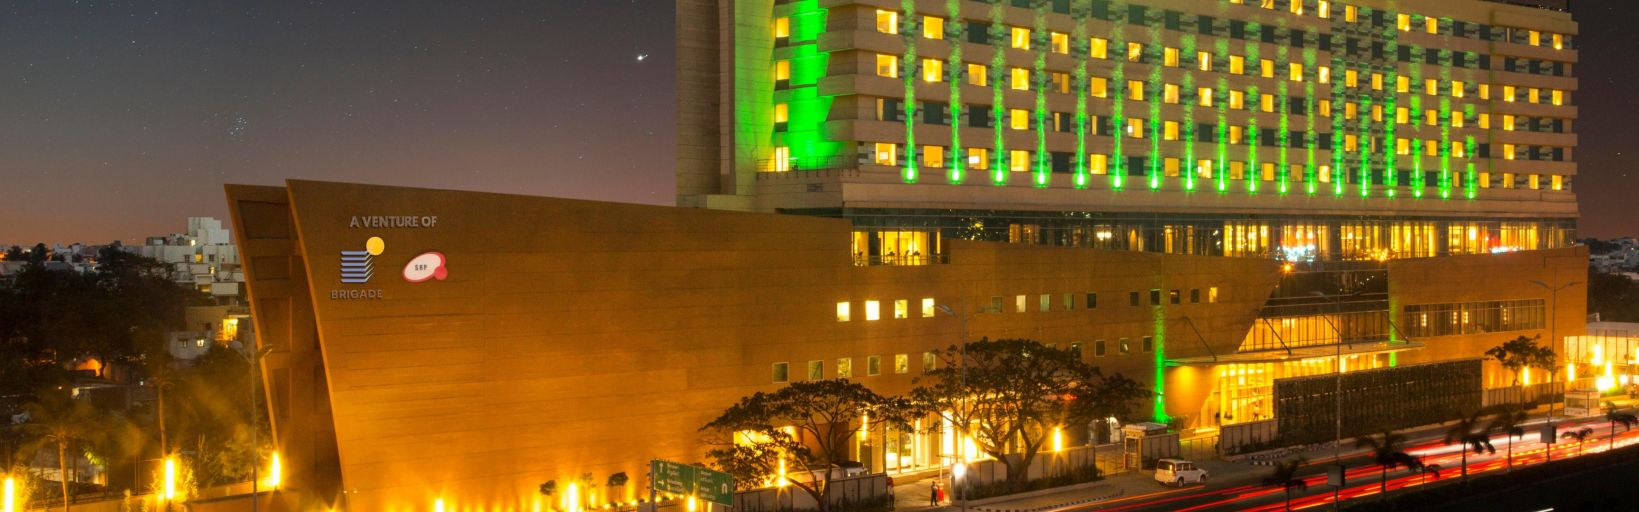 Holiday inn chennai omr it expressway hotel by ihg hotel exterior solutioingenieria Choice Image